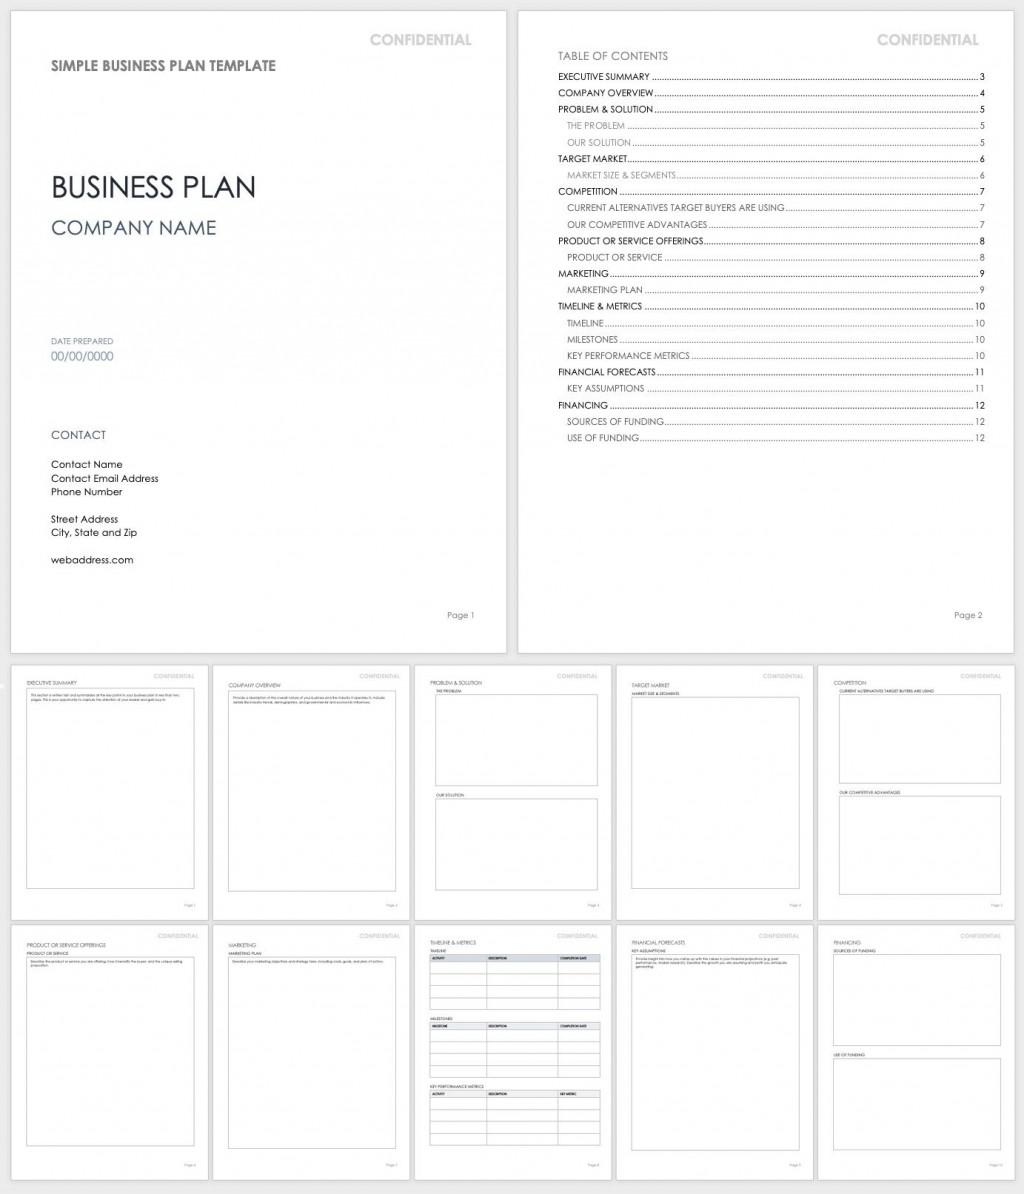 005 Impressive Basic Busines Plan Template Image  Templates Simple Uk Free Restaurant Sample Pdf WordLarge